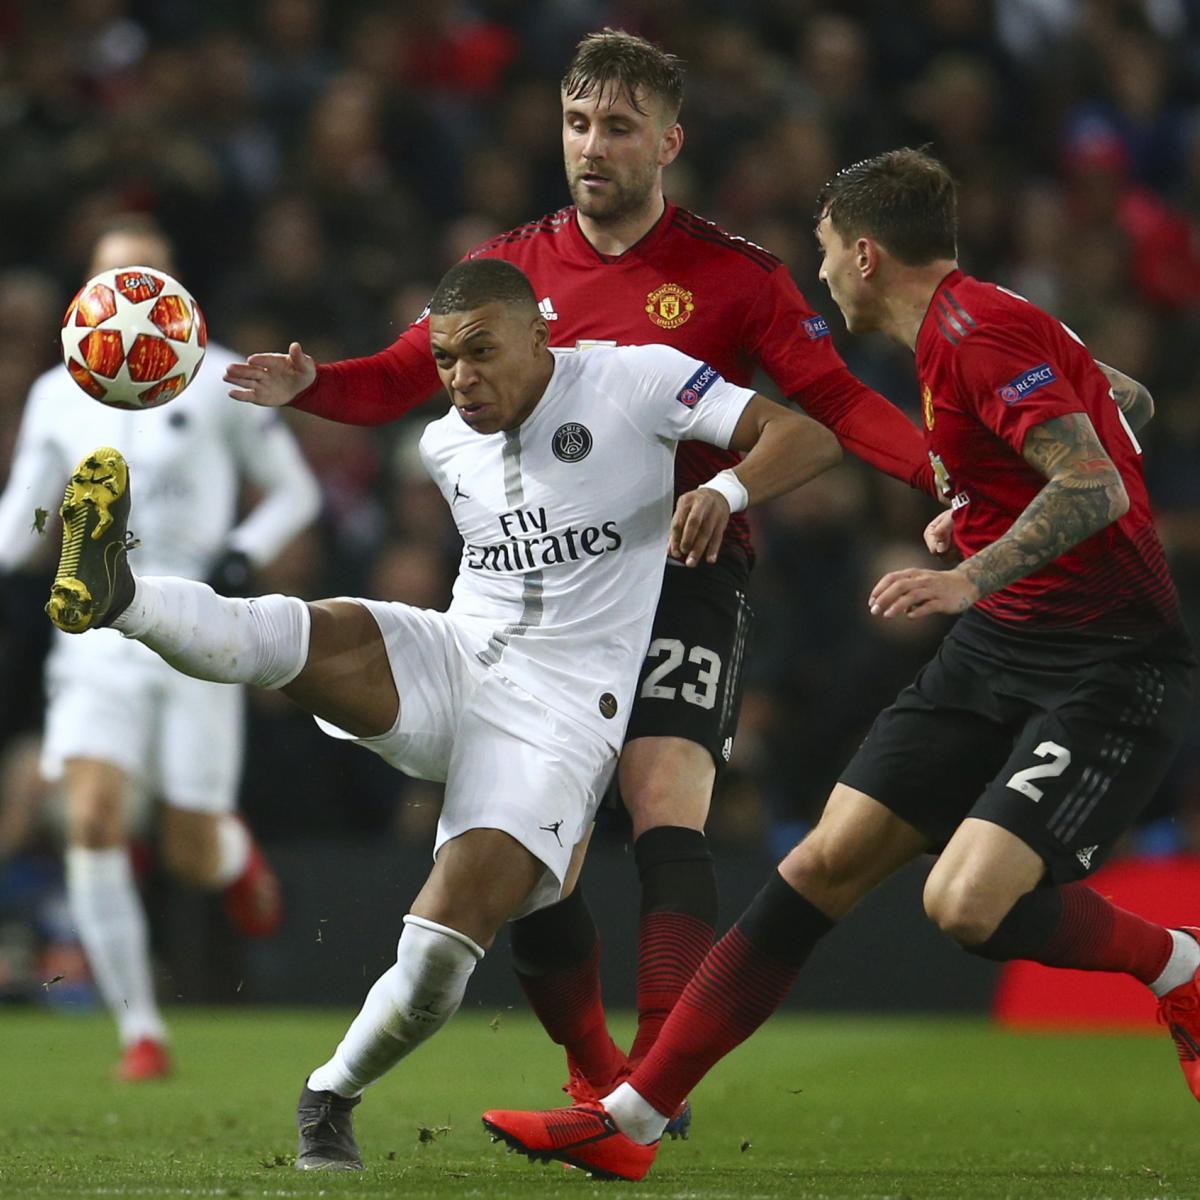 Champions League 2019 Round Of 16 Leg 2 Live Stream Tv: PSG Vs. Manchester United: Preview, Live Stream, TV Info